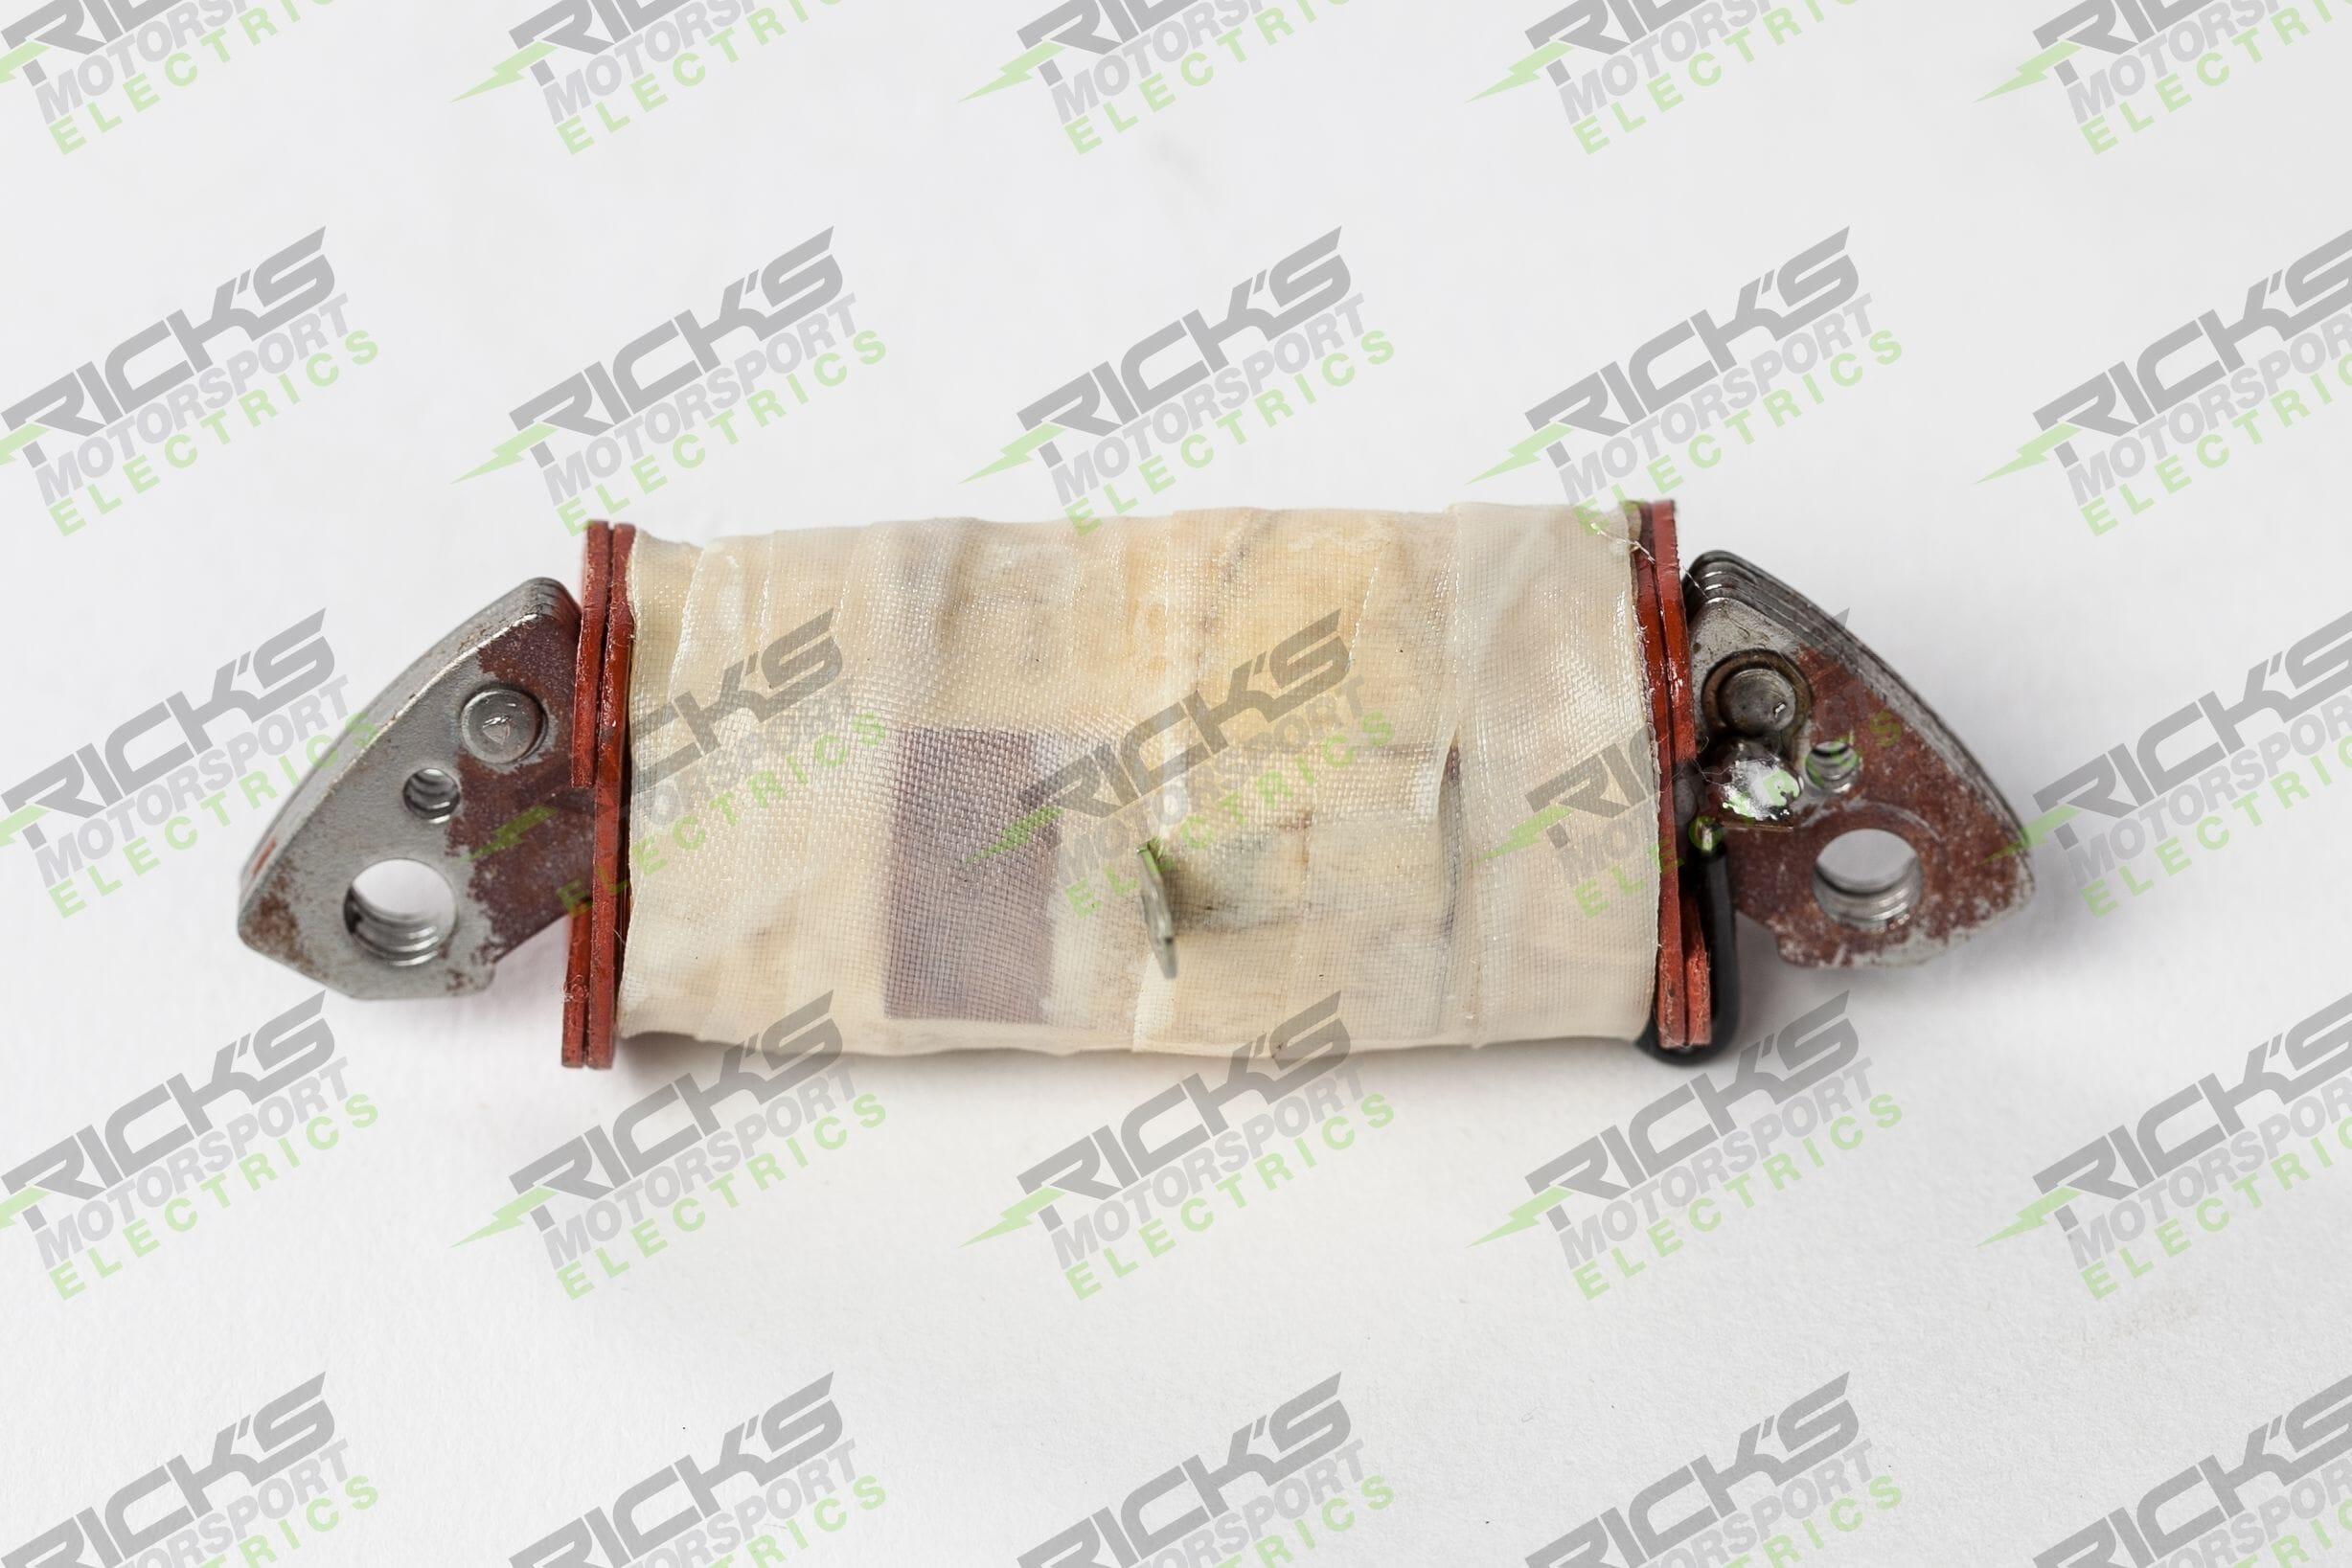 Honda Pulsar Coil_Source Coil 22_601